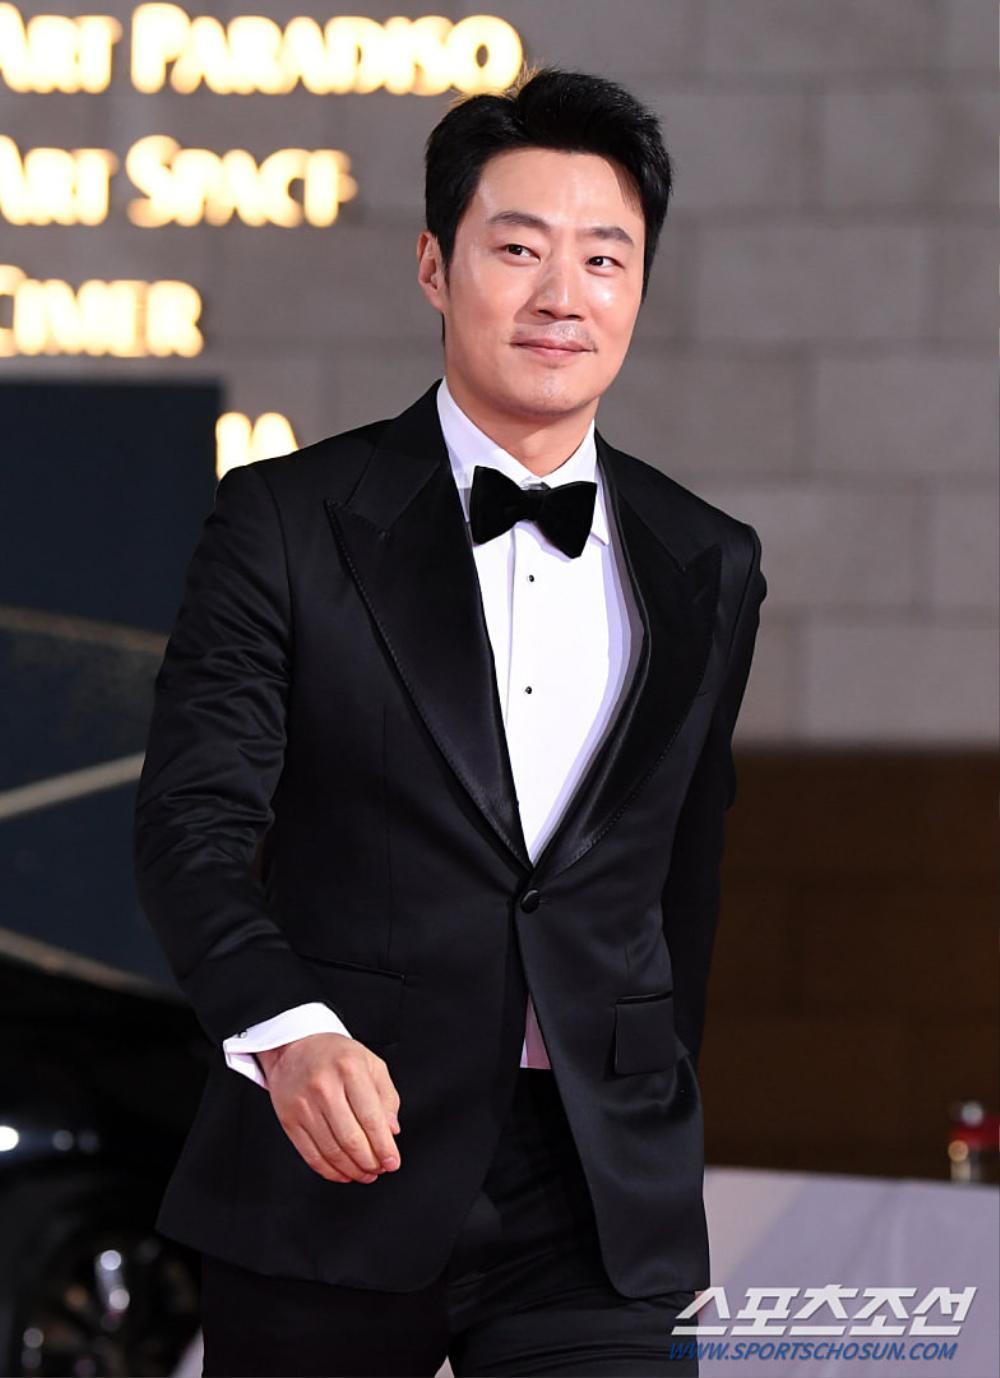 Thảm đỏ 'Rồng xanh 2020': Shin Hye Sun 'cân sắc' Shin Min Ah, Jung Woo Sung - Lee Byung Hun điển trai! Ảnh 40